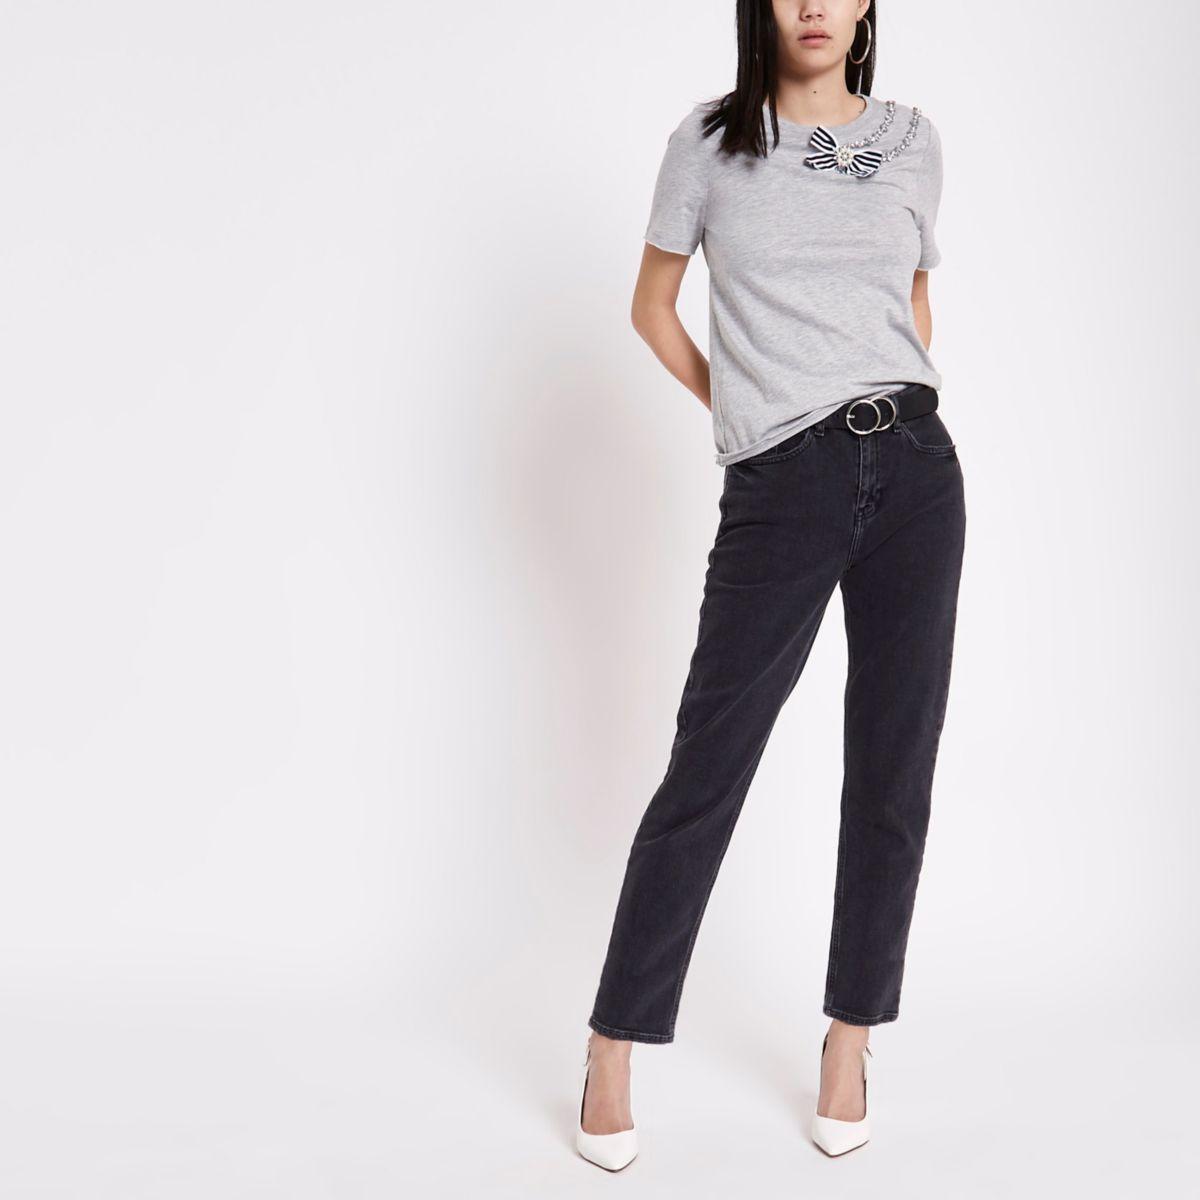 Grey short sleeve rhinestone T-shirt